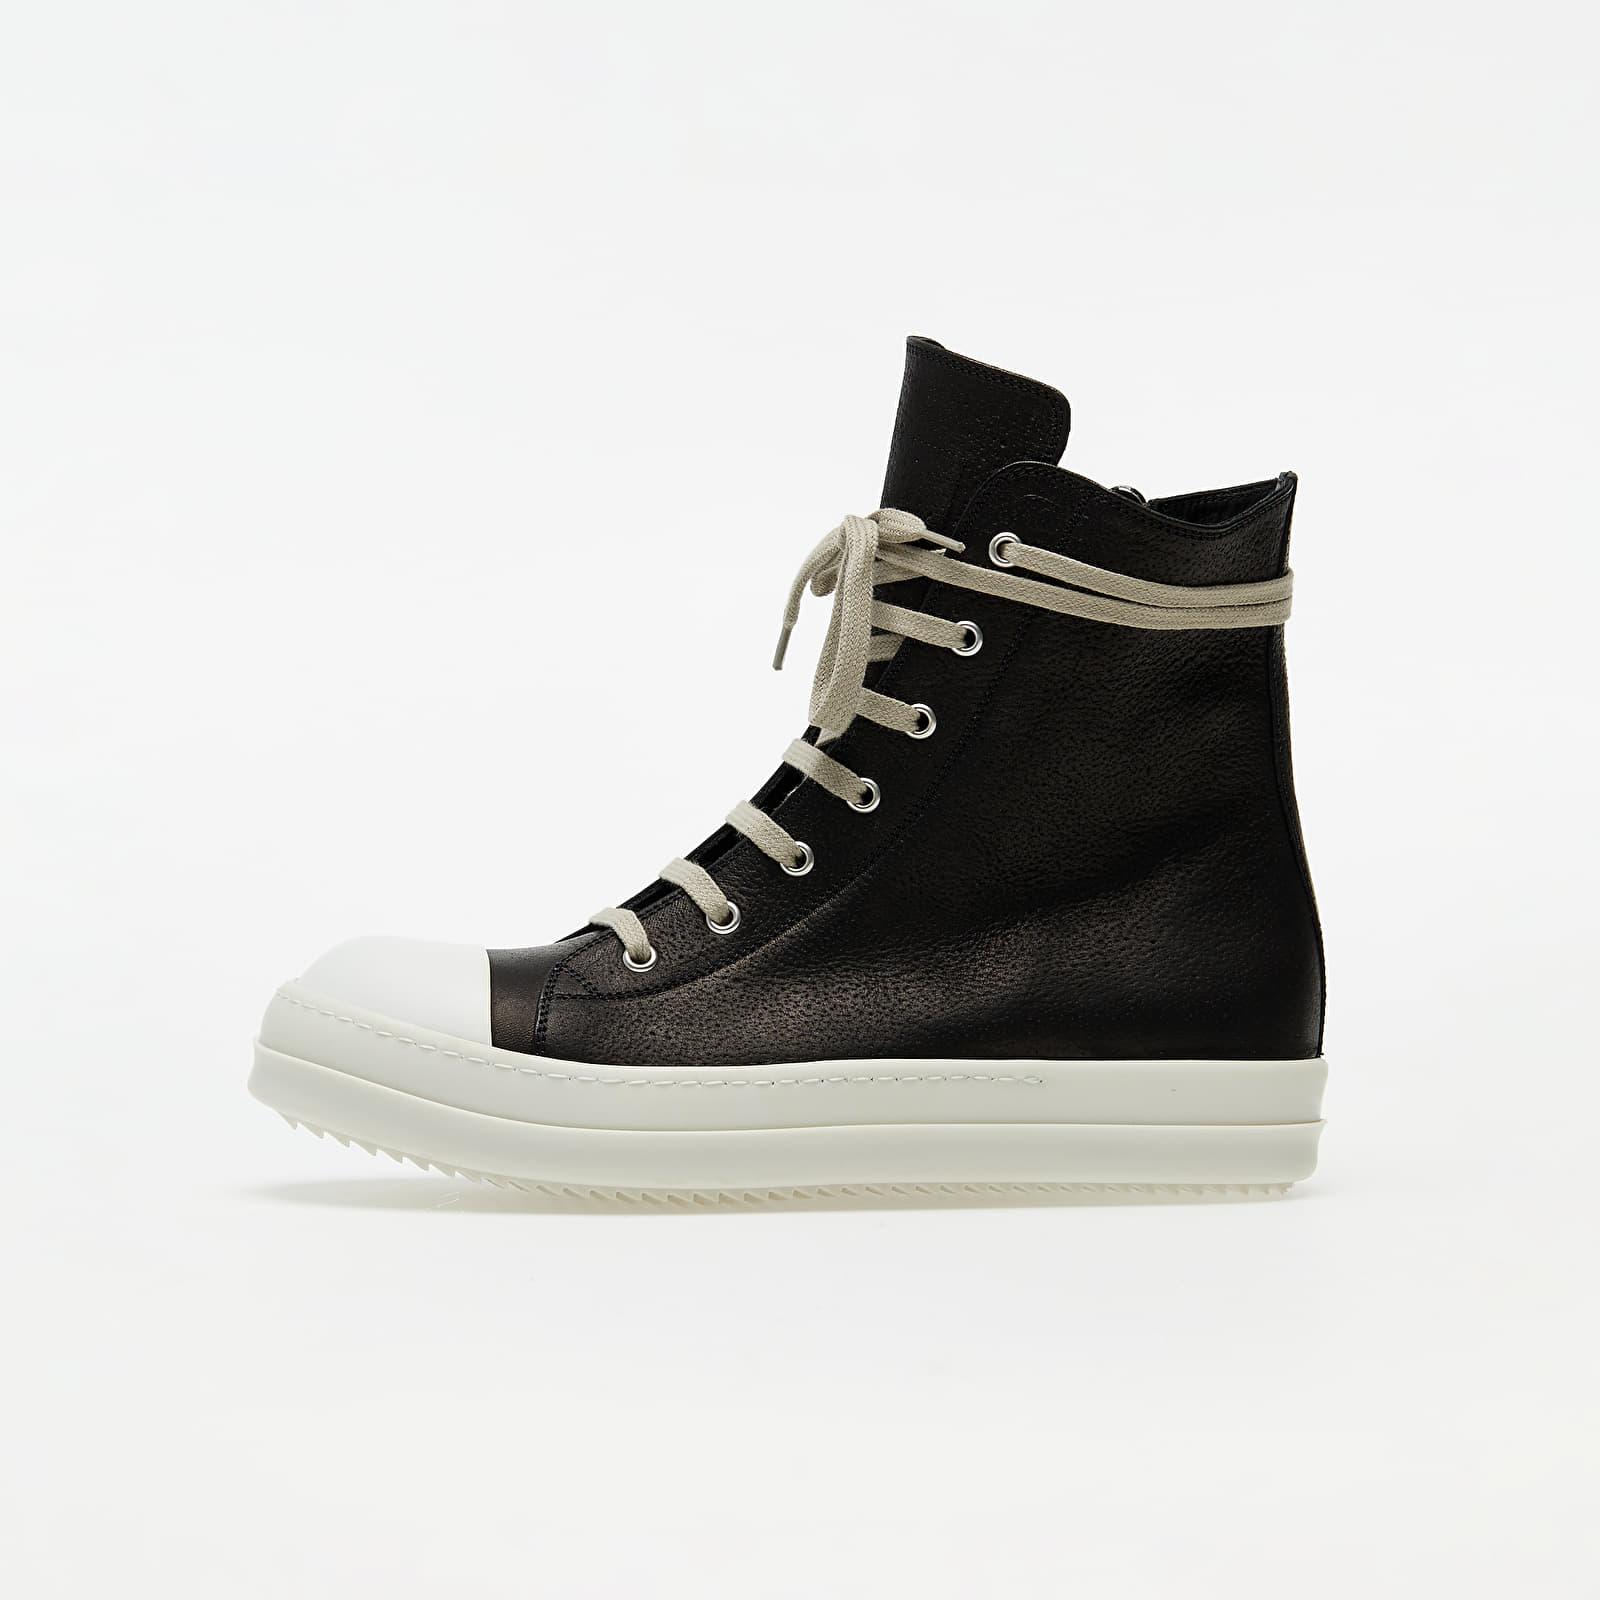 Férfi cipők Rick Owens Sneakers Black/ White